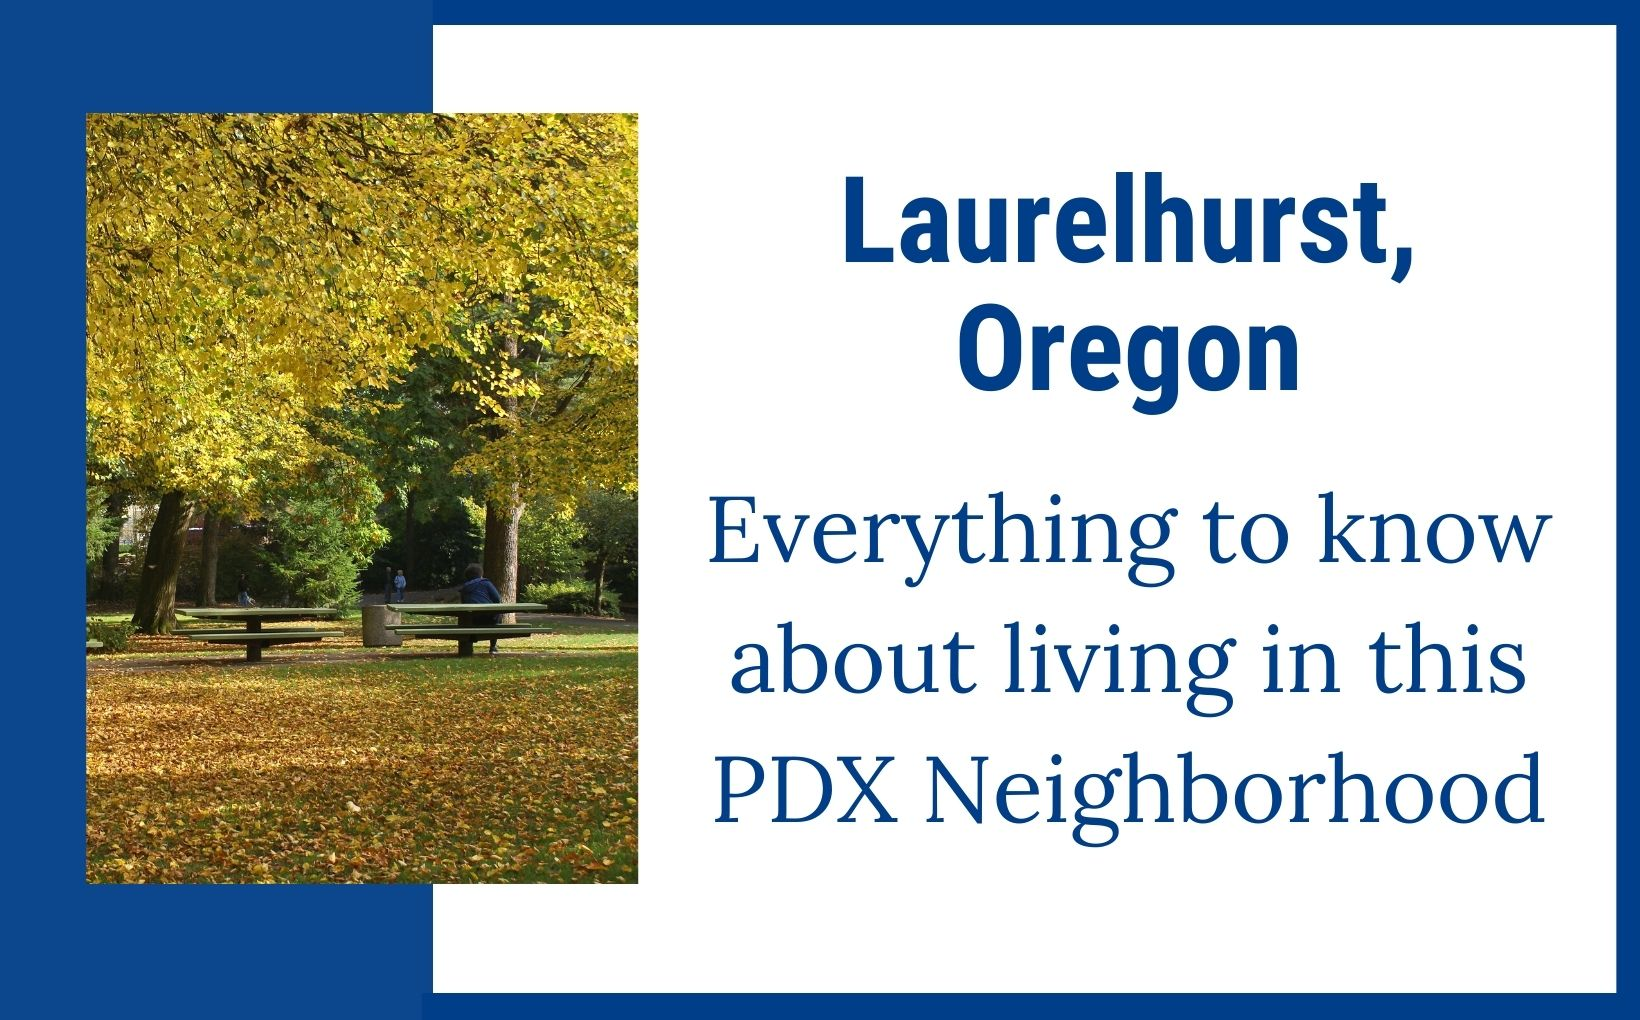 Laurelhurst Neighborhood of Portland Oregon feature image